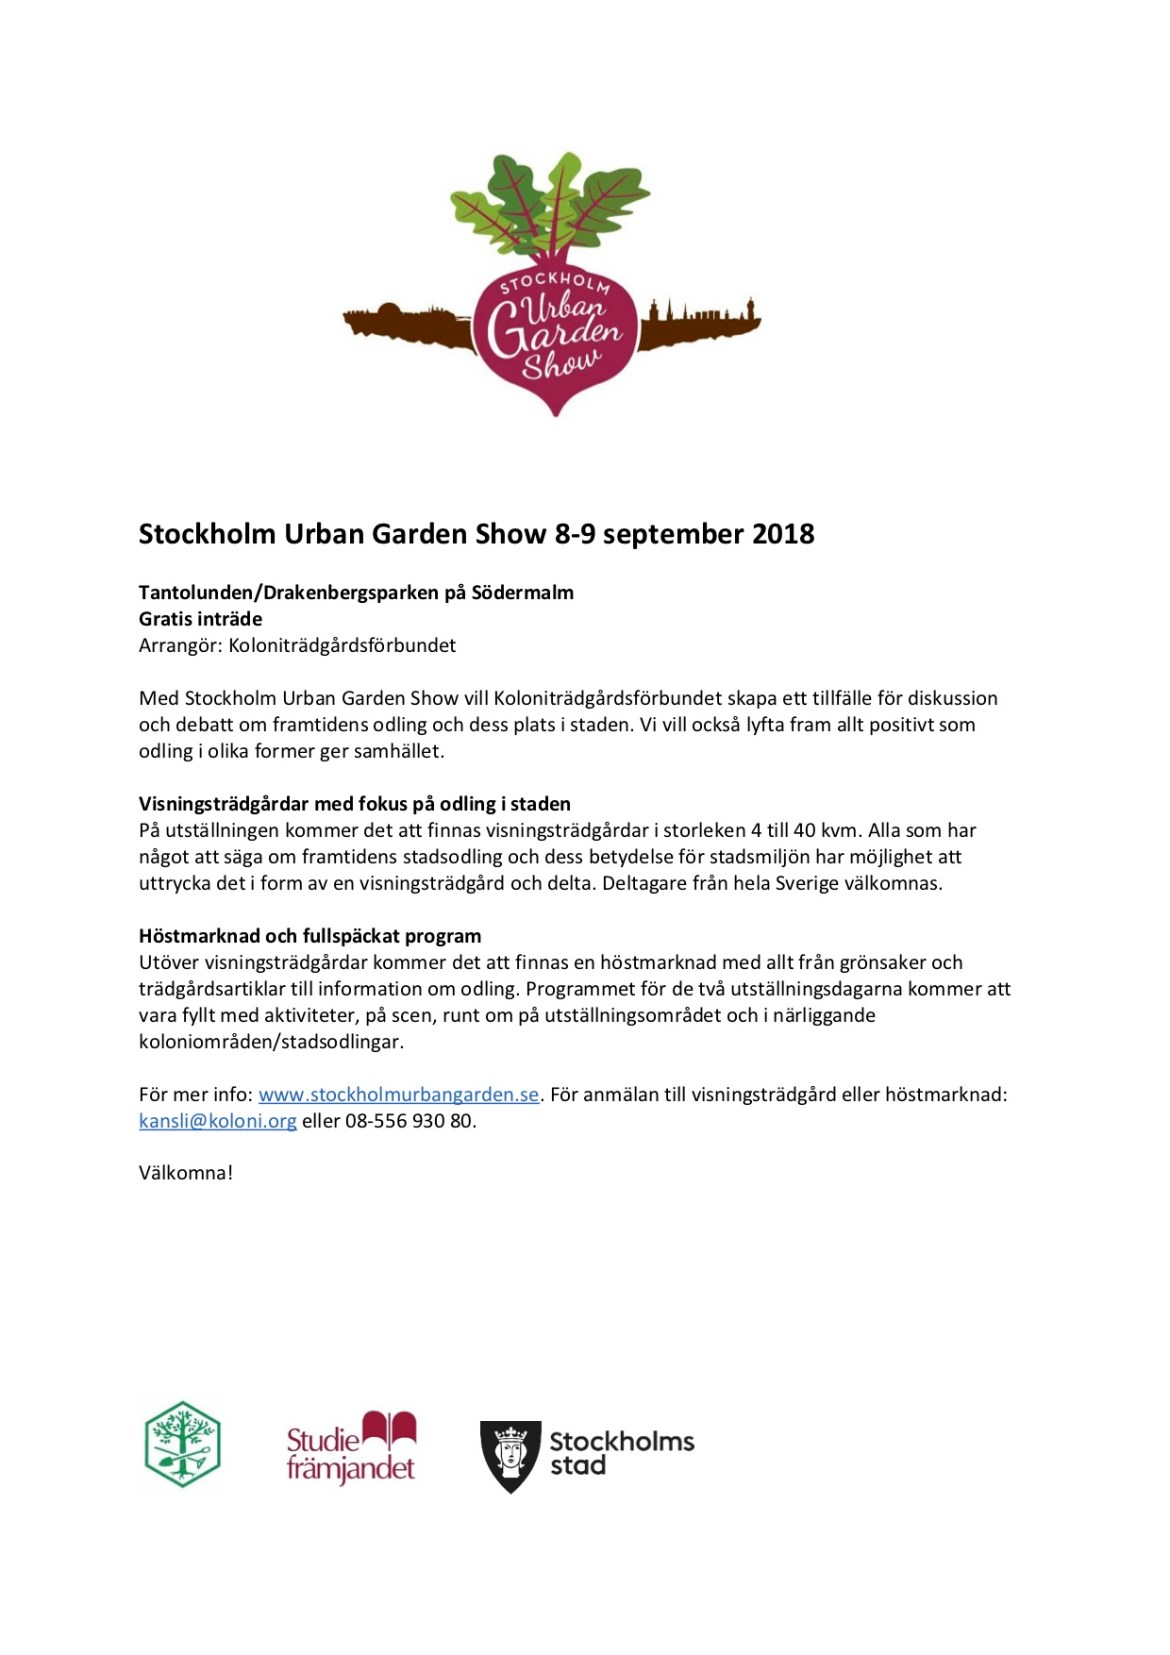 180201 Information om Stockholm Urban Garden Show 2018 us